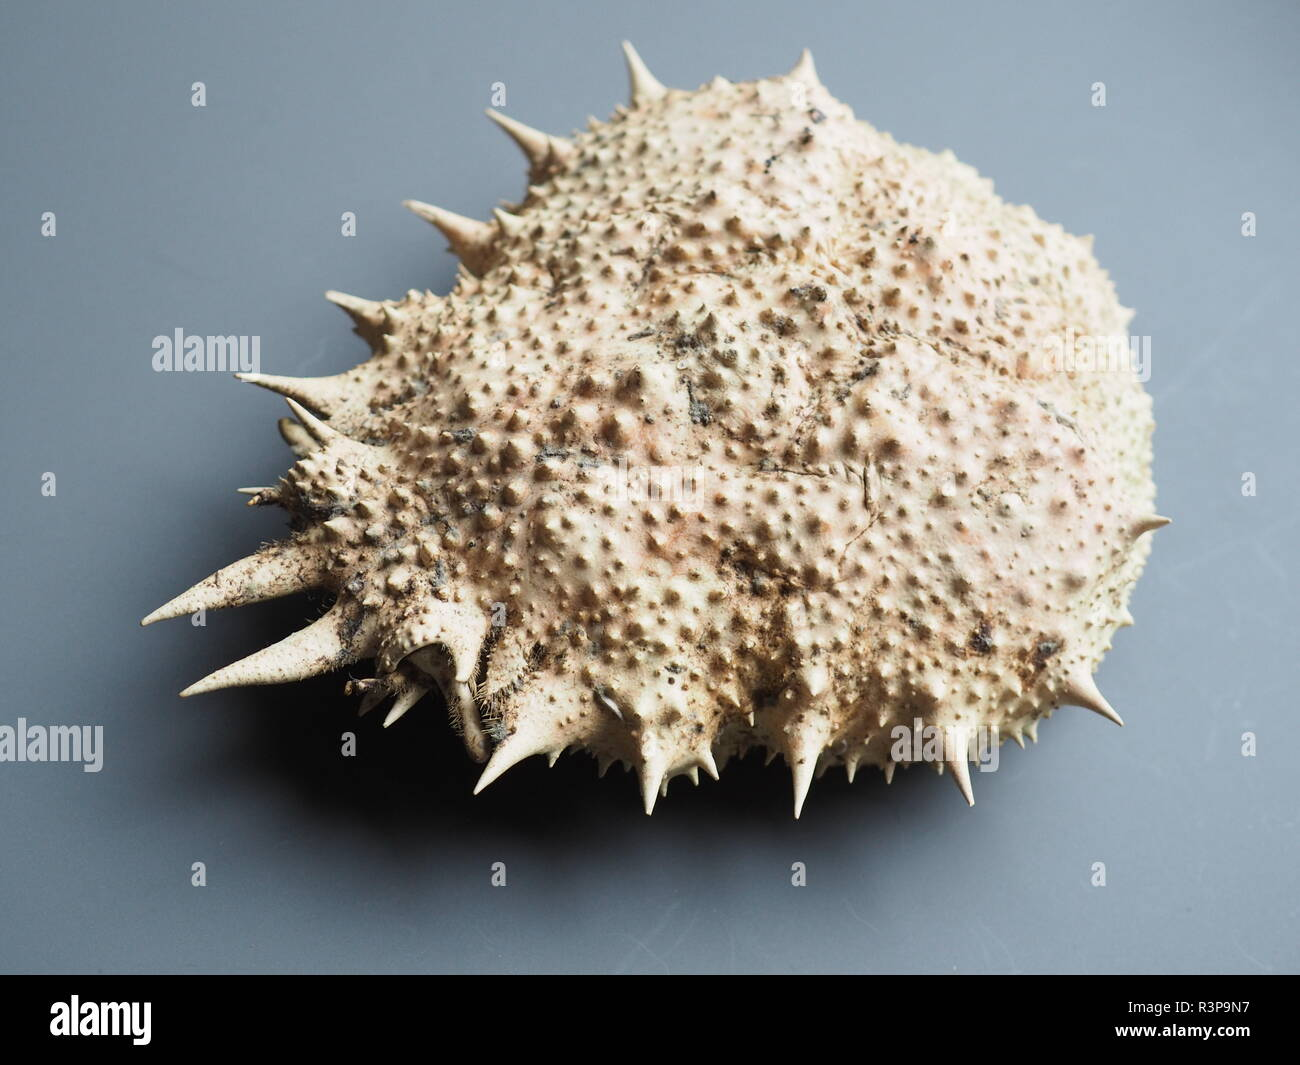 crab body - Stock Image